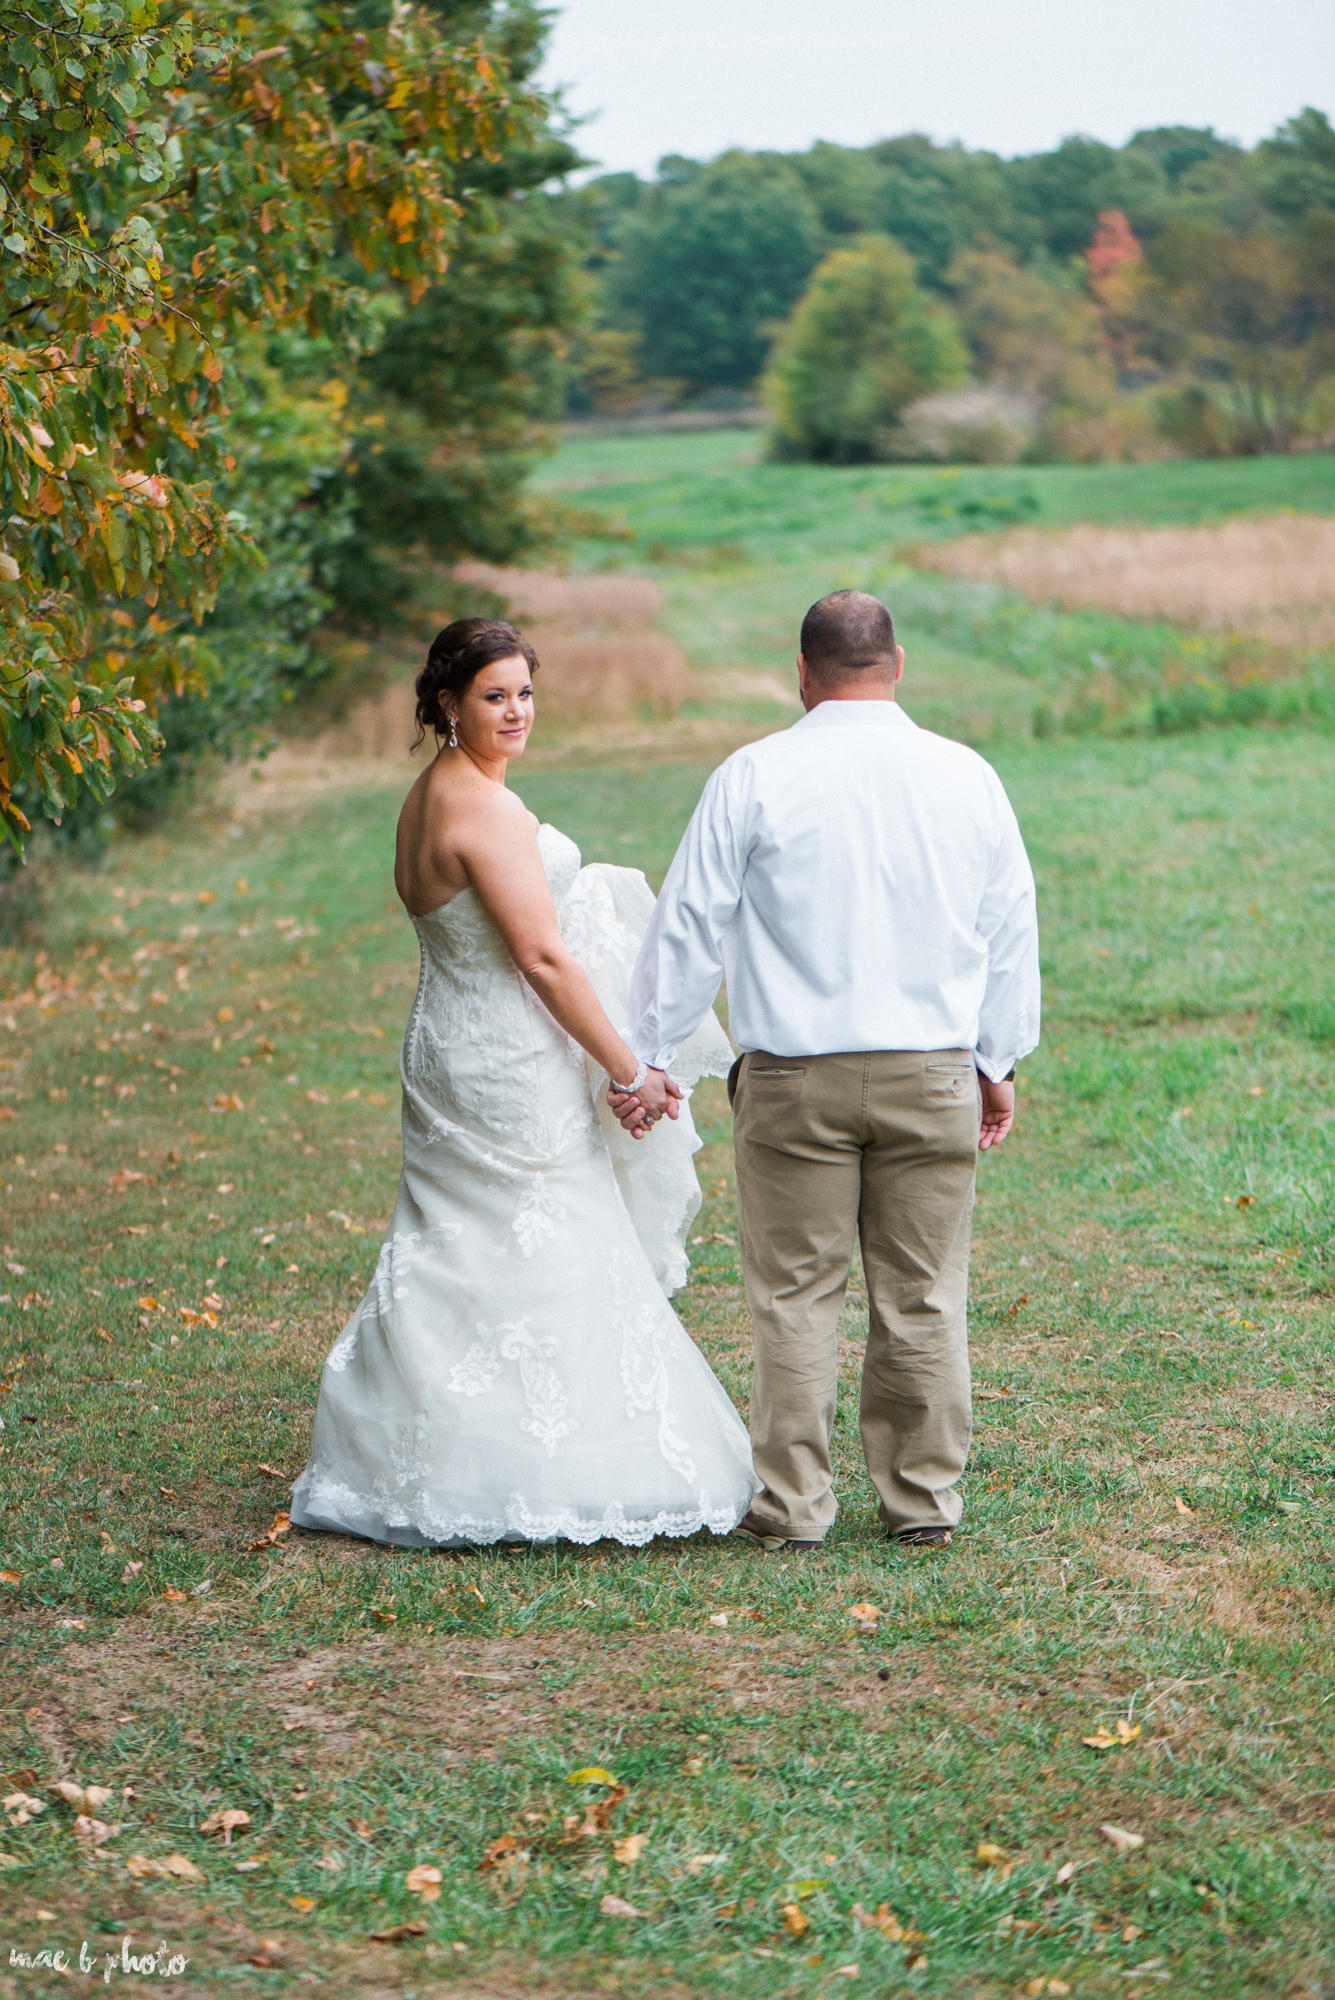 Sarah & Dustin's Rustic Chic Barn Wedding at Hartford Hill Winery in Hartford, Ohio by Mae B Photo-72.jpg